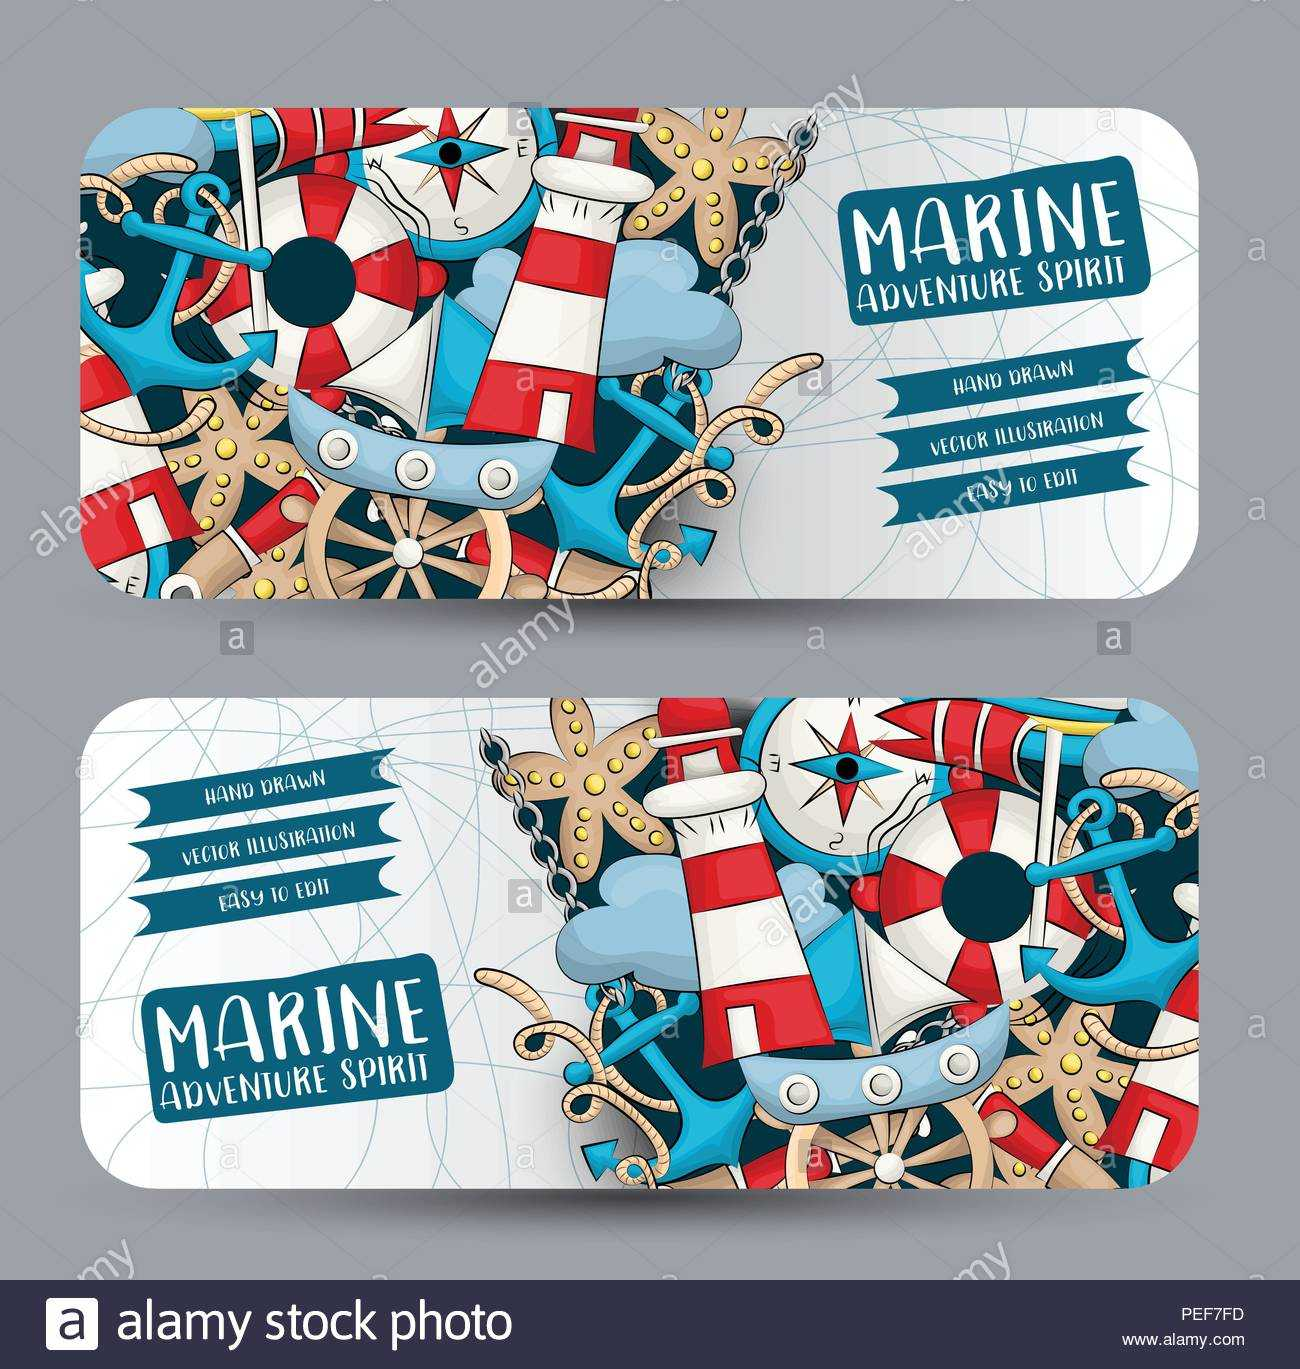 Marine Nautical Travel Concept. Horizontal Banner Template With Nautical Banner Template